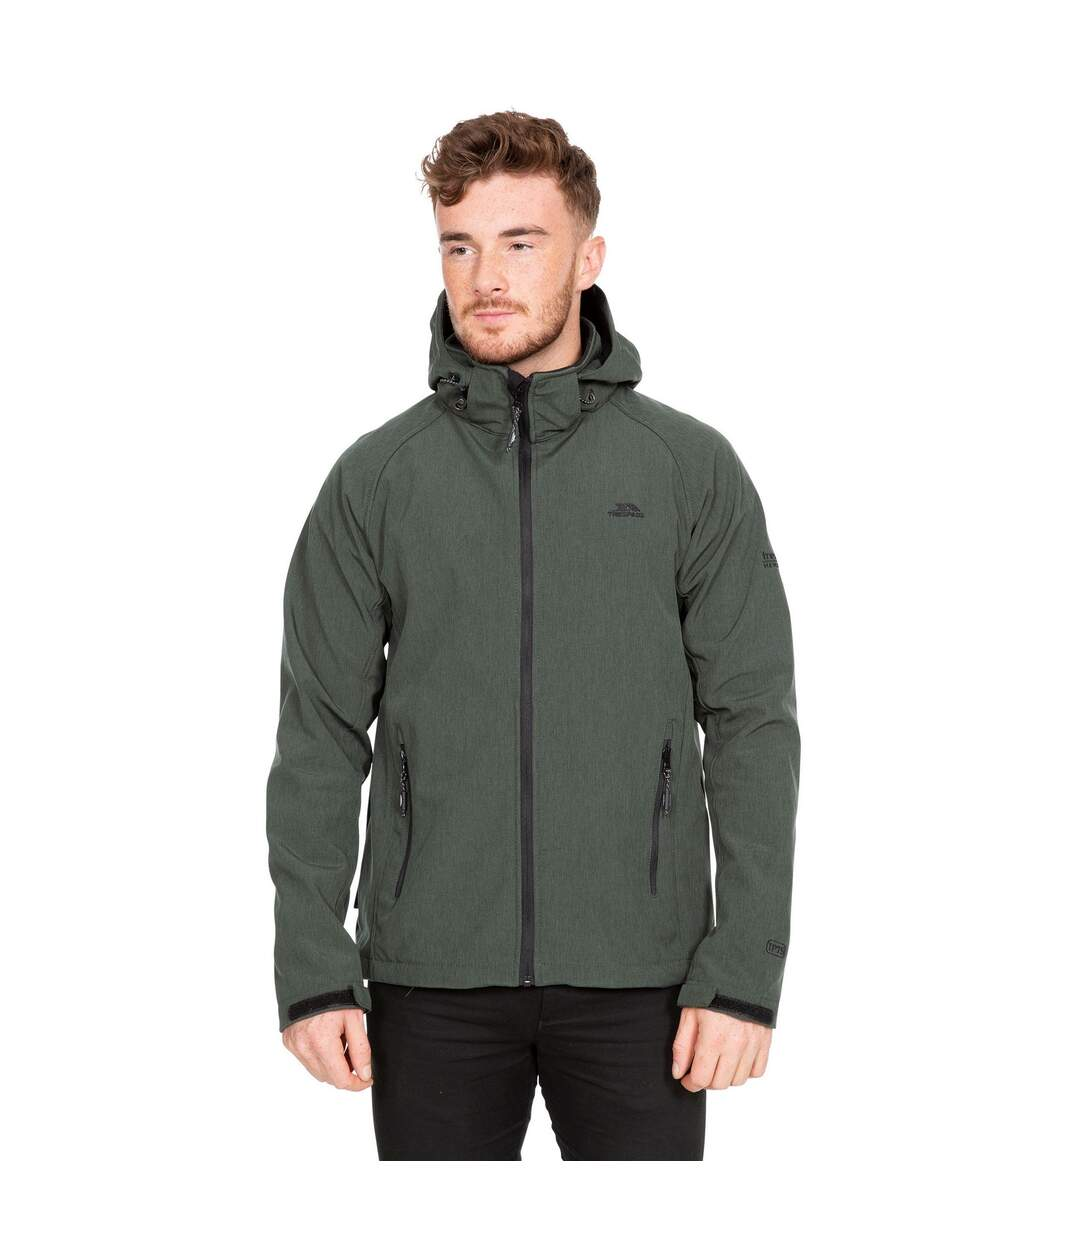 Trespass Mens Rafi Waterproof Softshell Jacket (Olive Marl) - UTTP3572